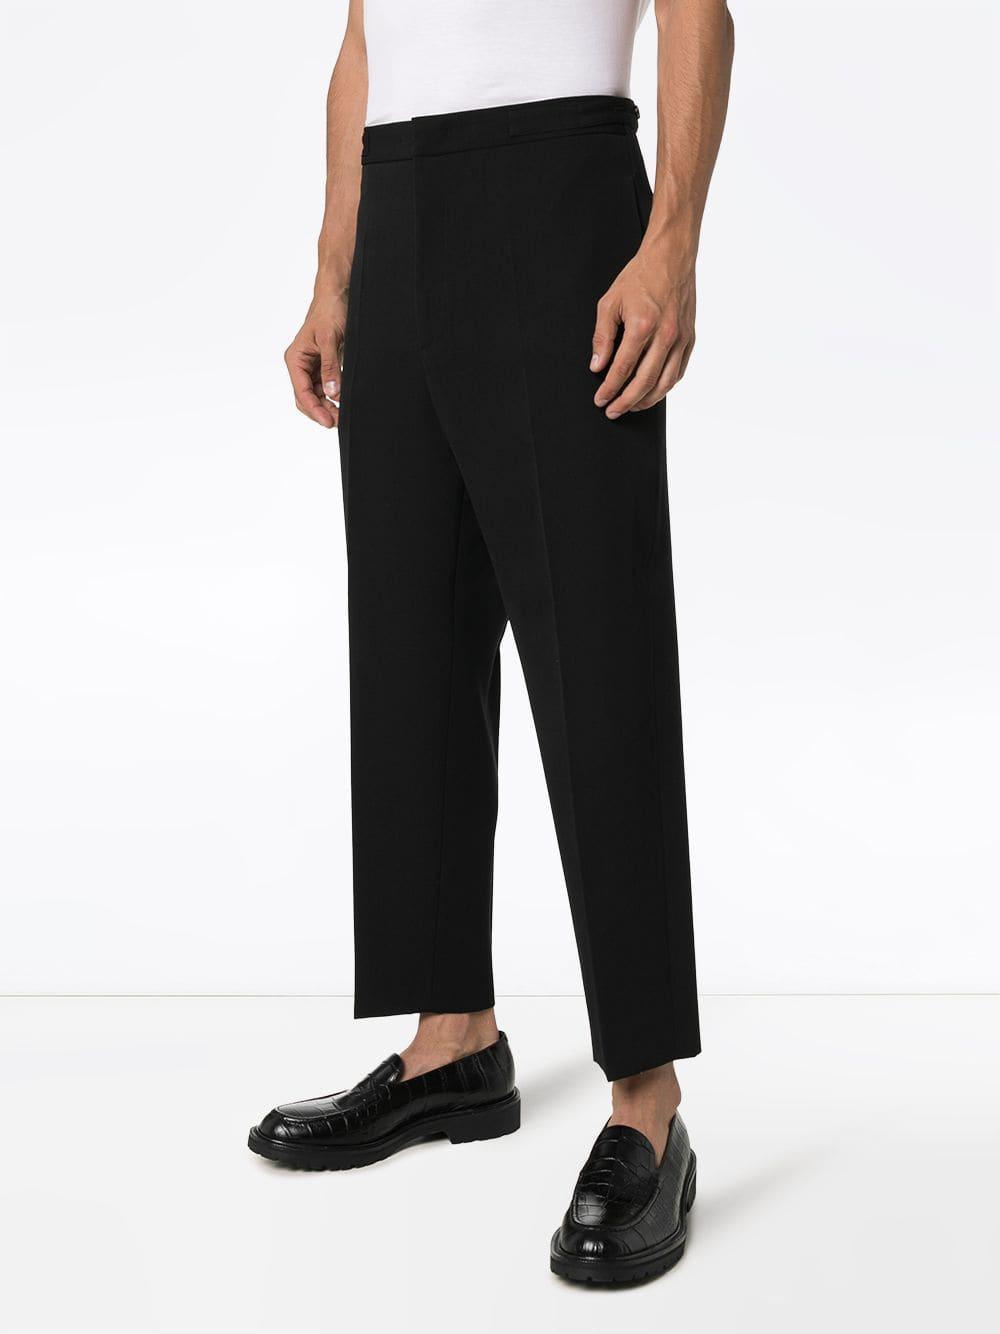 Jil Sander Wol Straight Pantalon in het Zwart voor heren